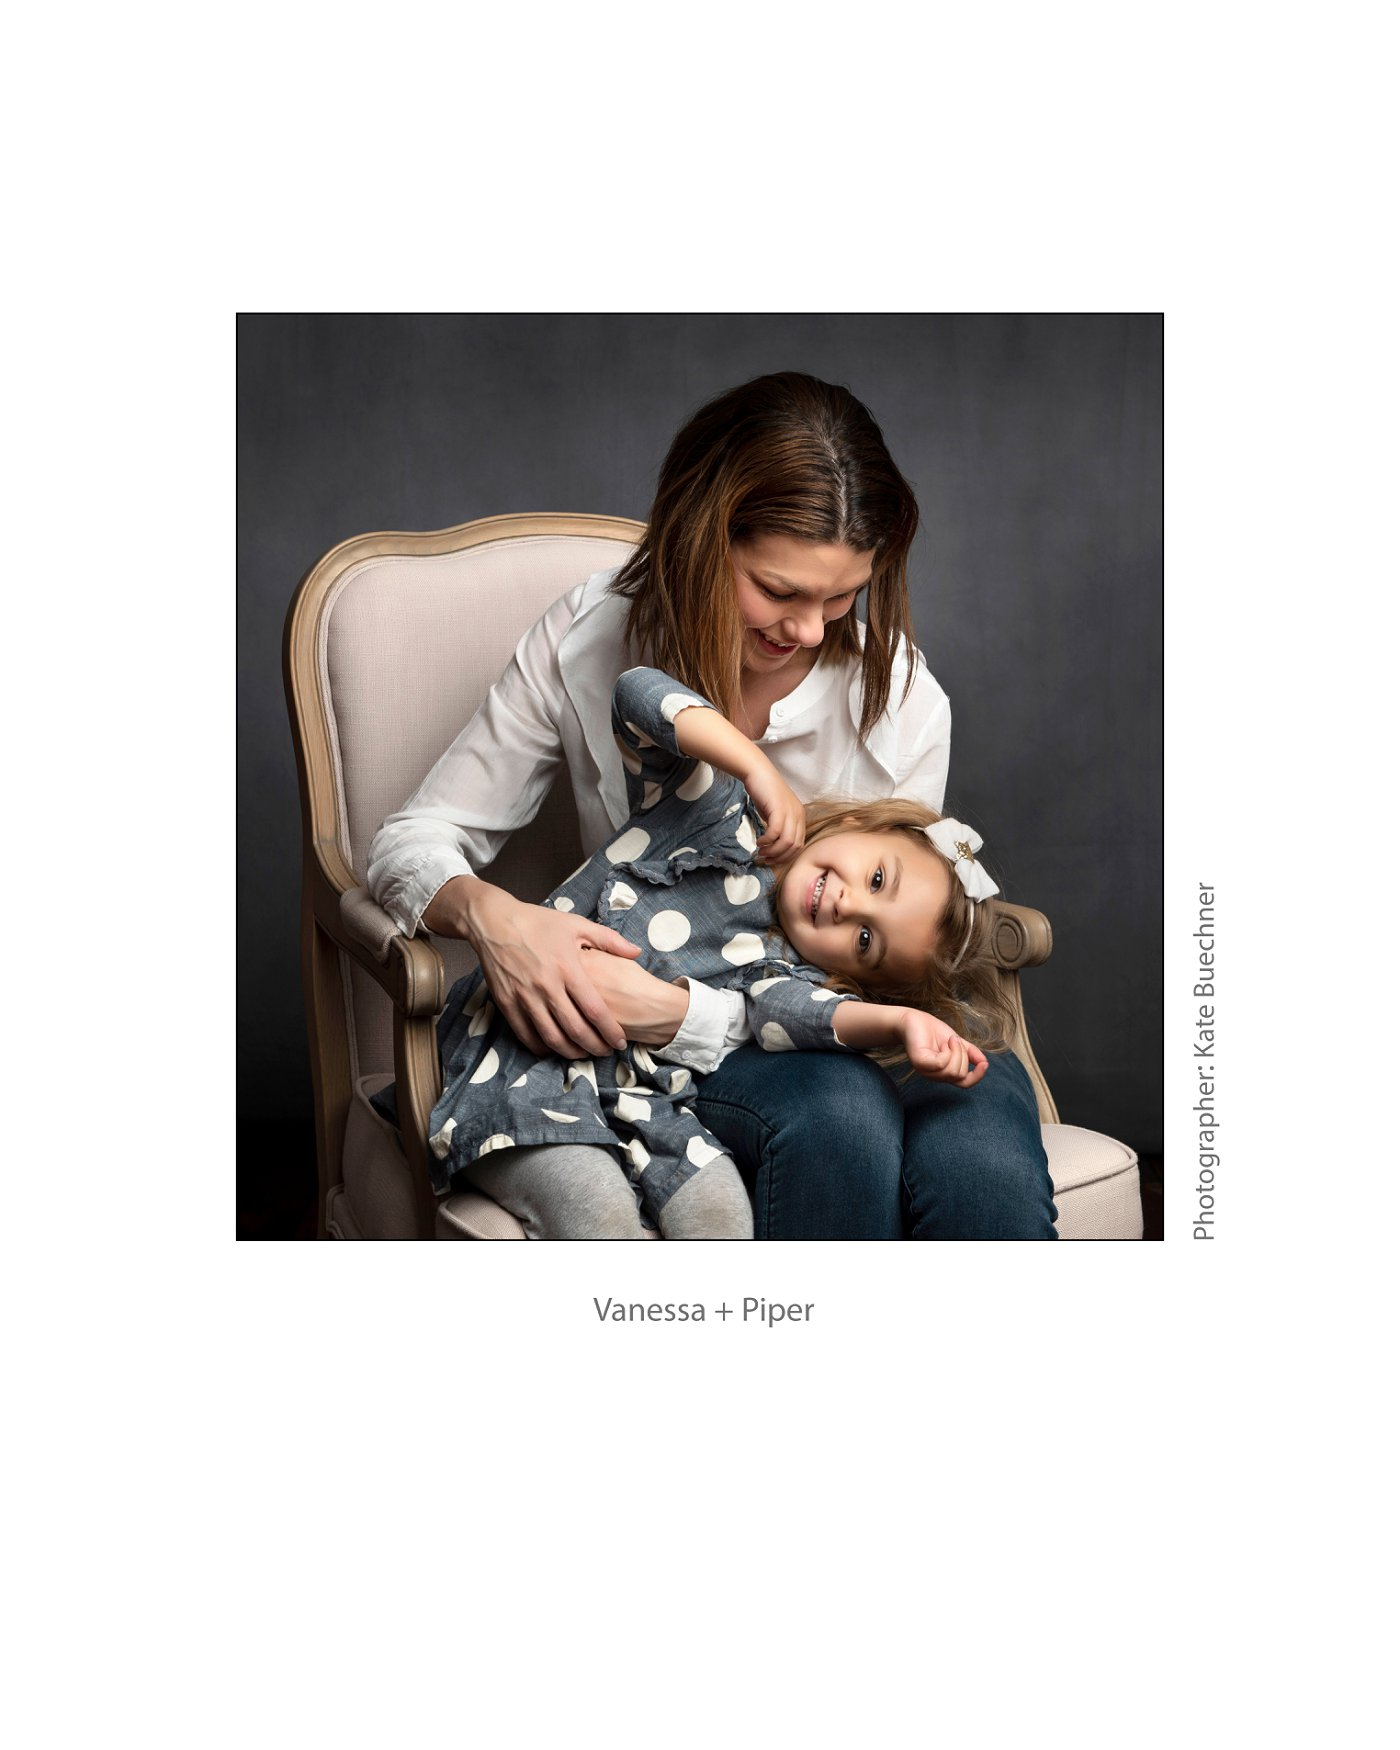 family photographer sydney (4).jpg